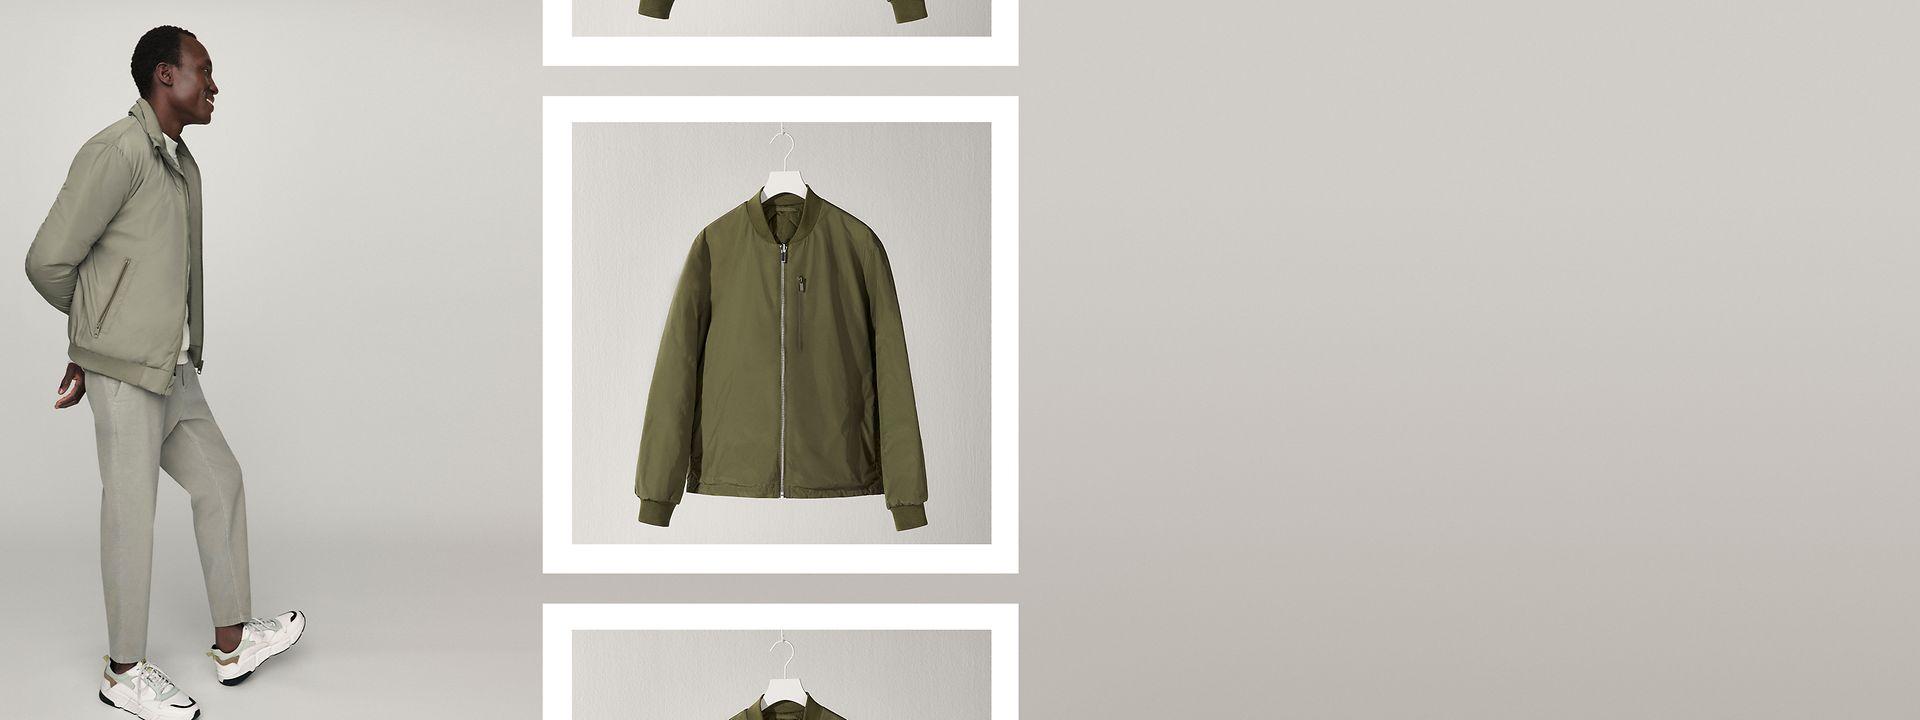 352021 - men - startpage - main banner - light jacket (1)